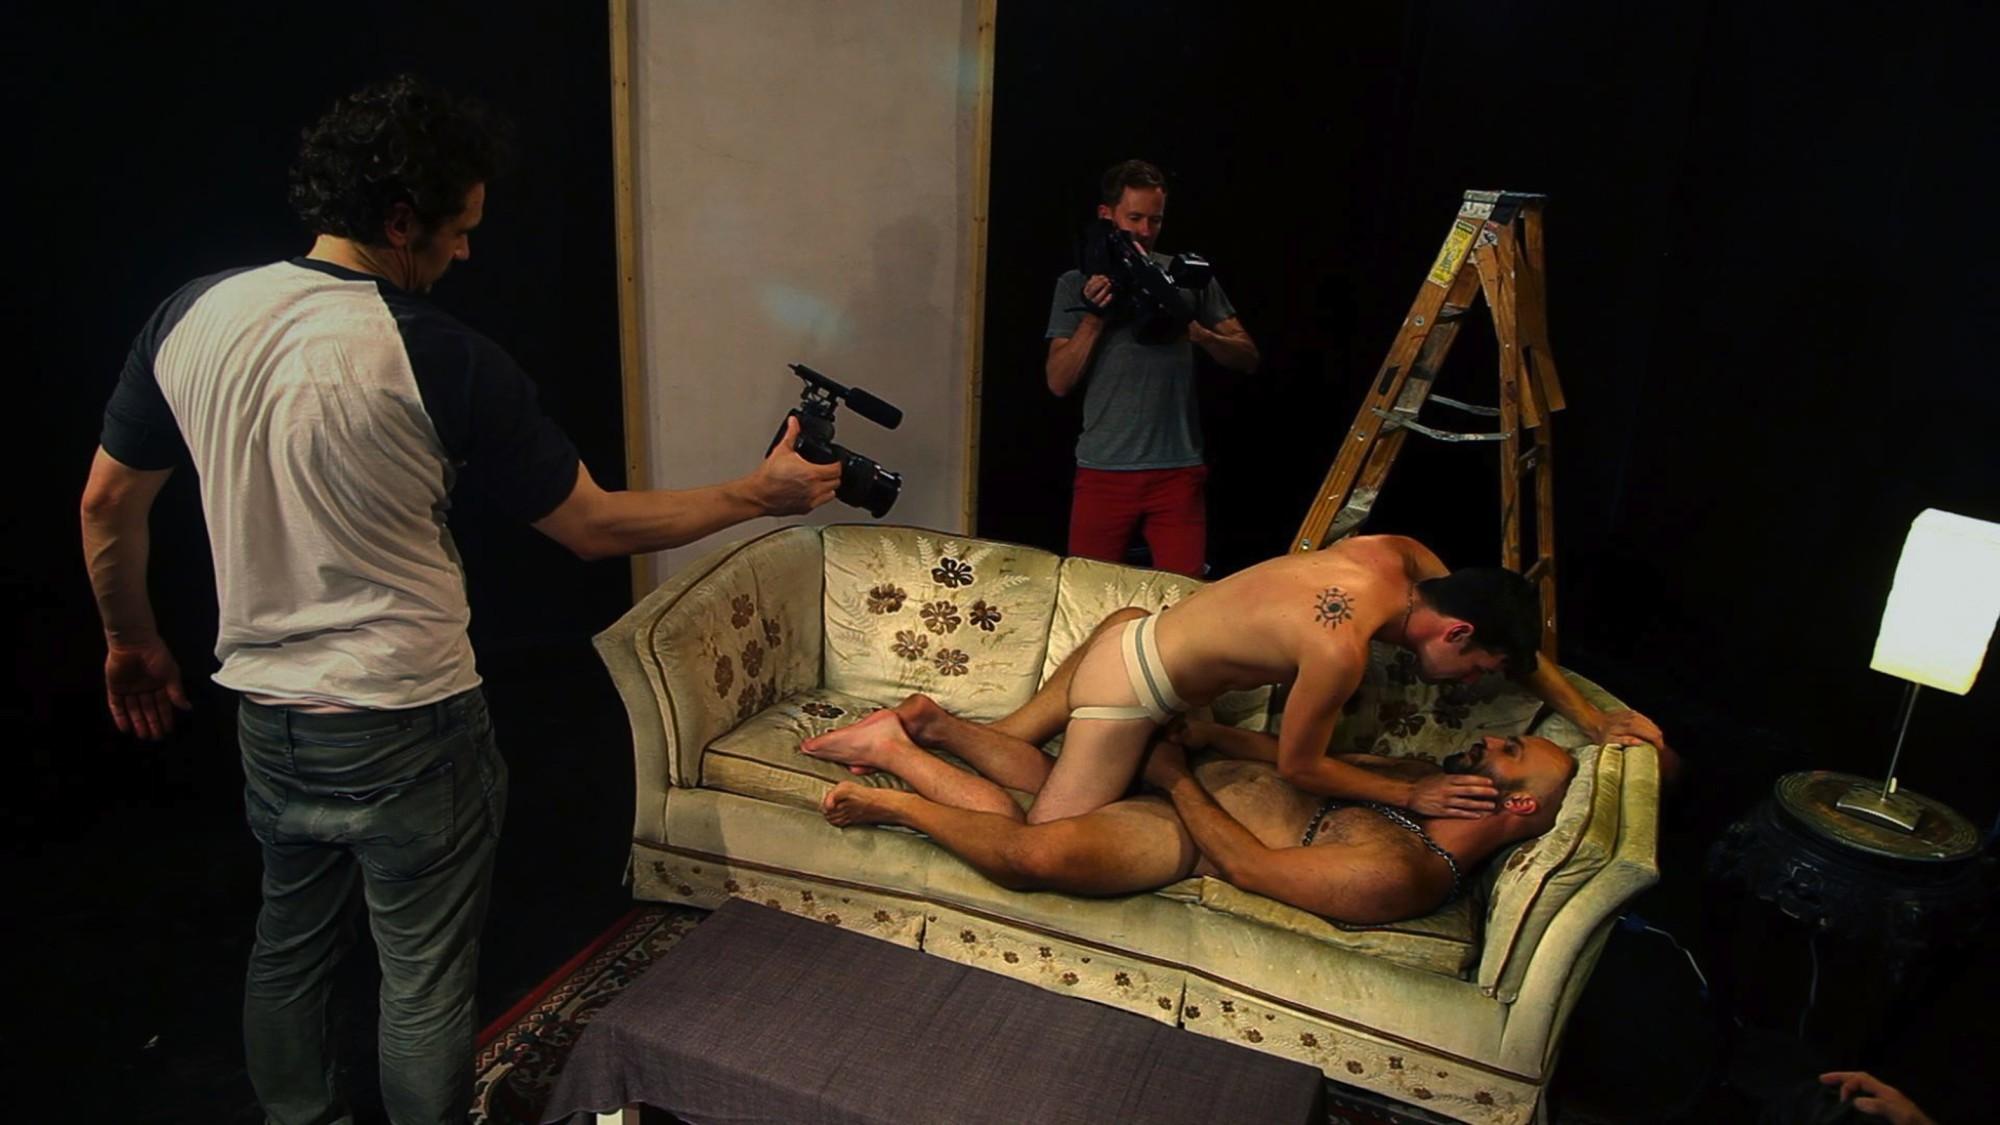 Erotische Ästhetik statt Schmuddelfilm. Foto: Pornfilmfestival Berlin 2013